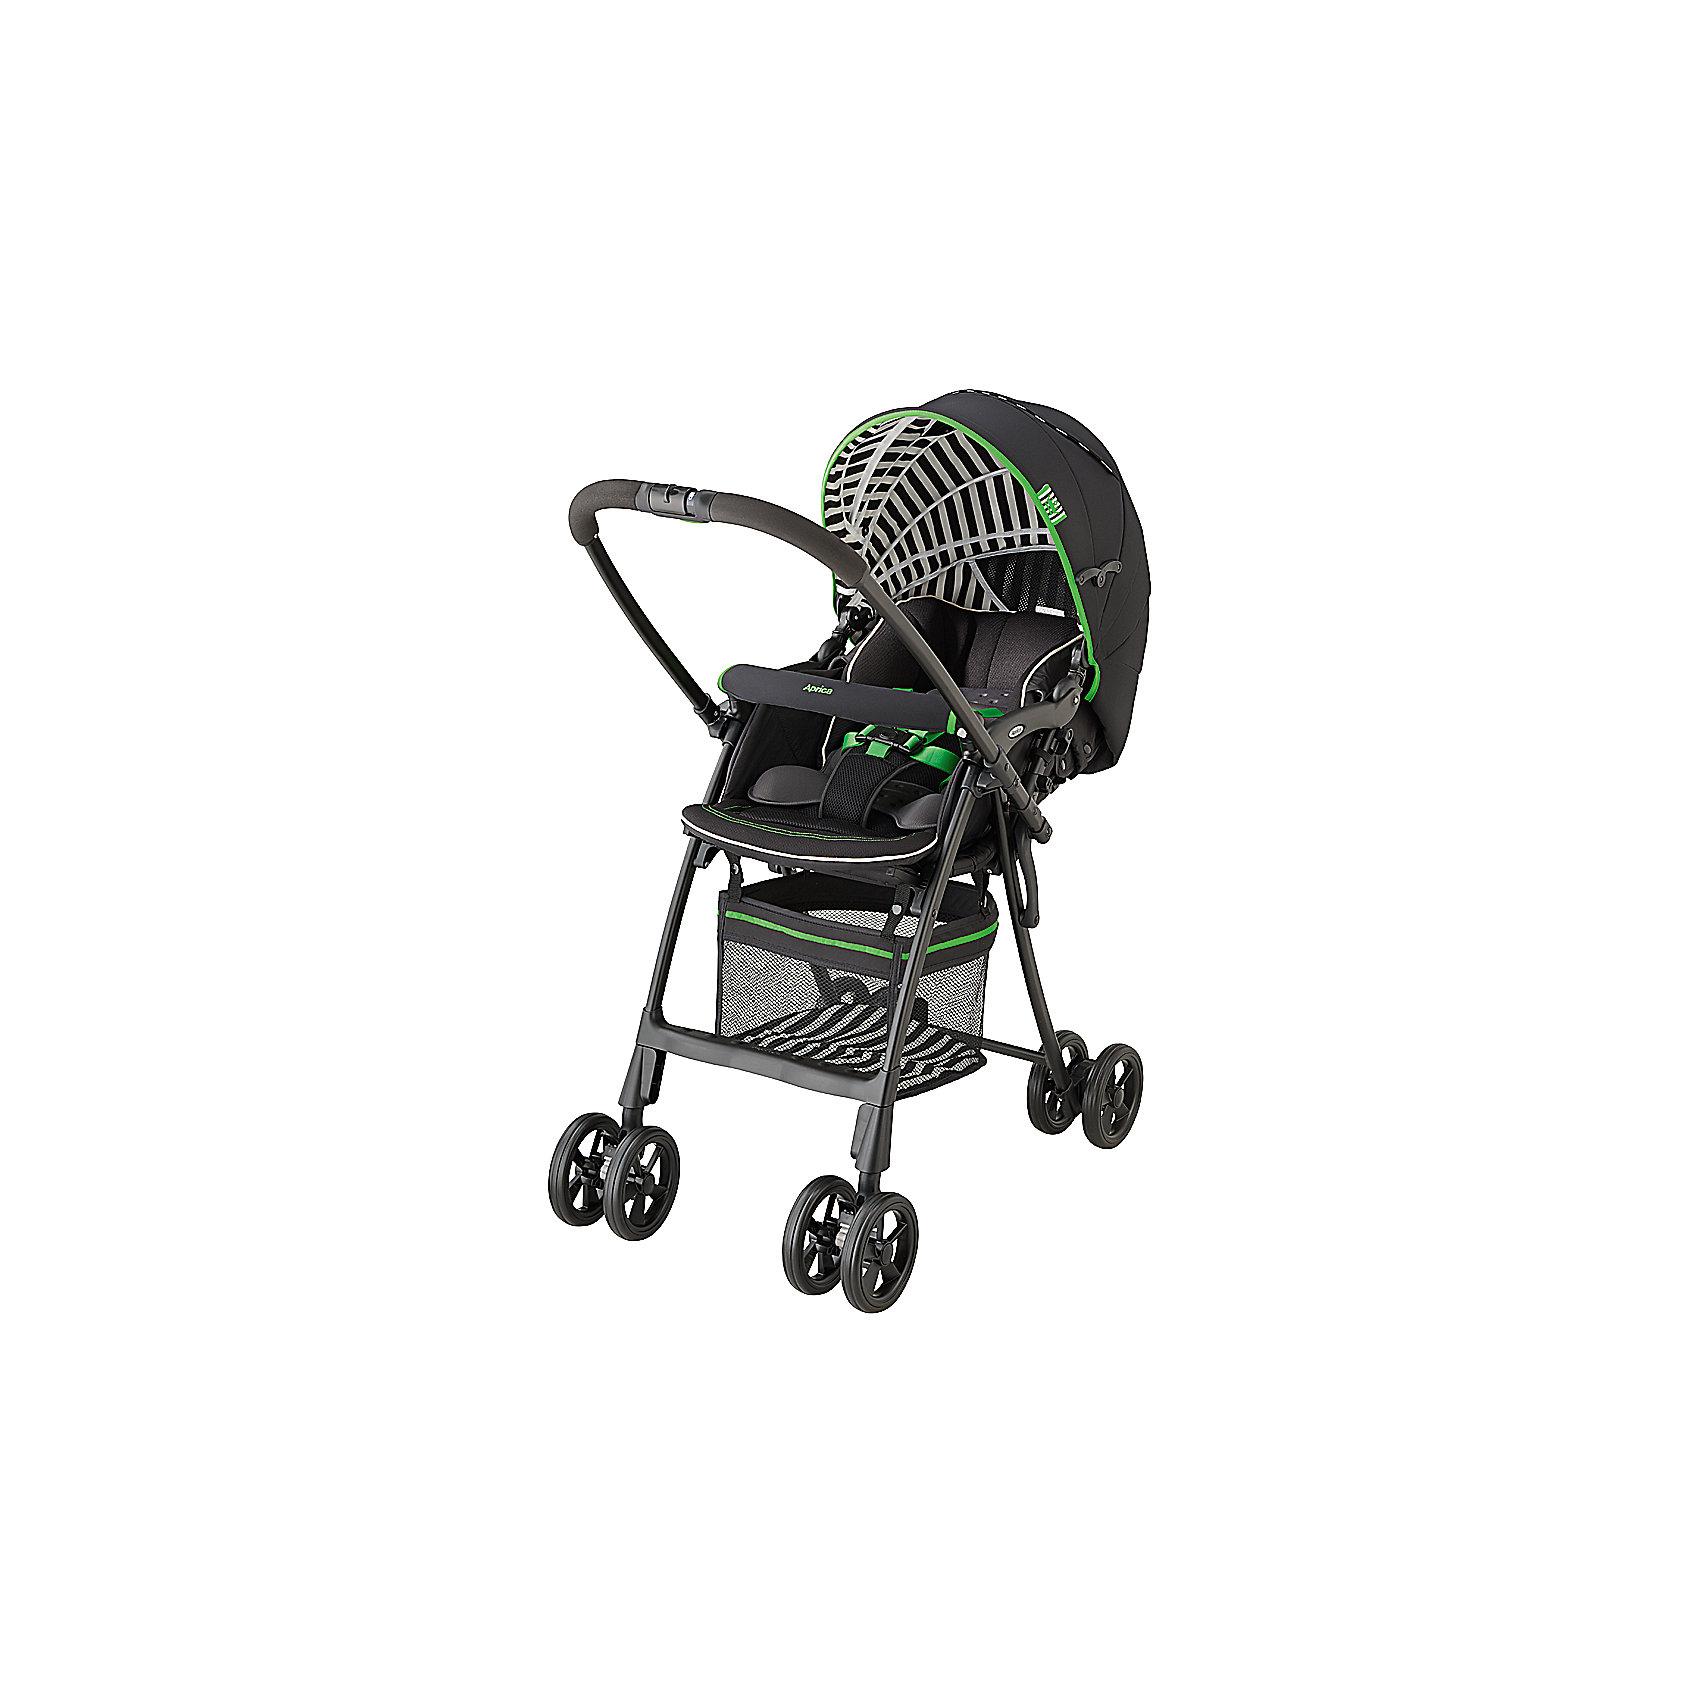 Прогулочная коляска FlyLe netro stripe, Aprica, черный